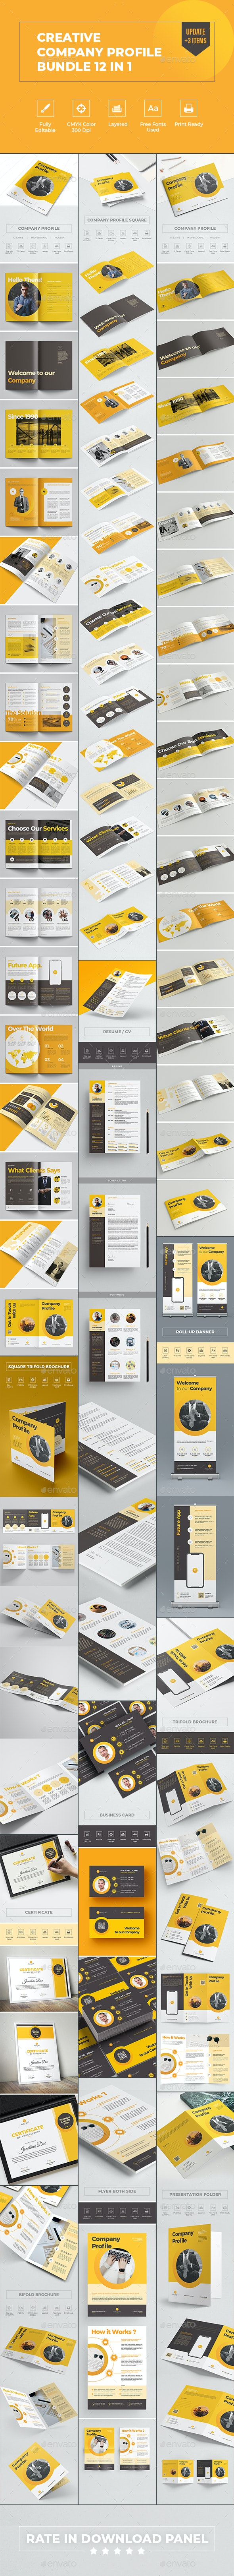 Creative Company Profile Bundle 12 in 1 - Corporate Brochures